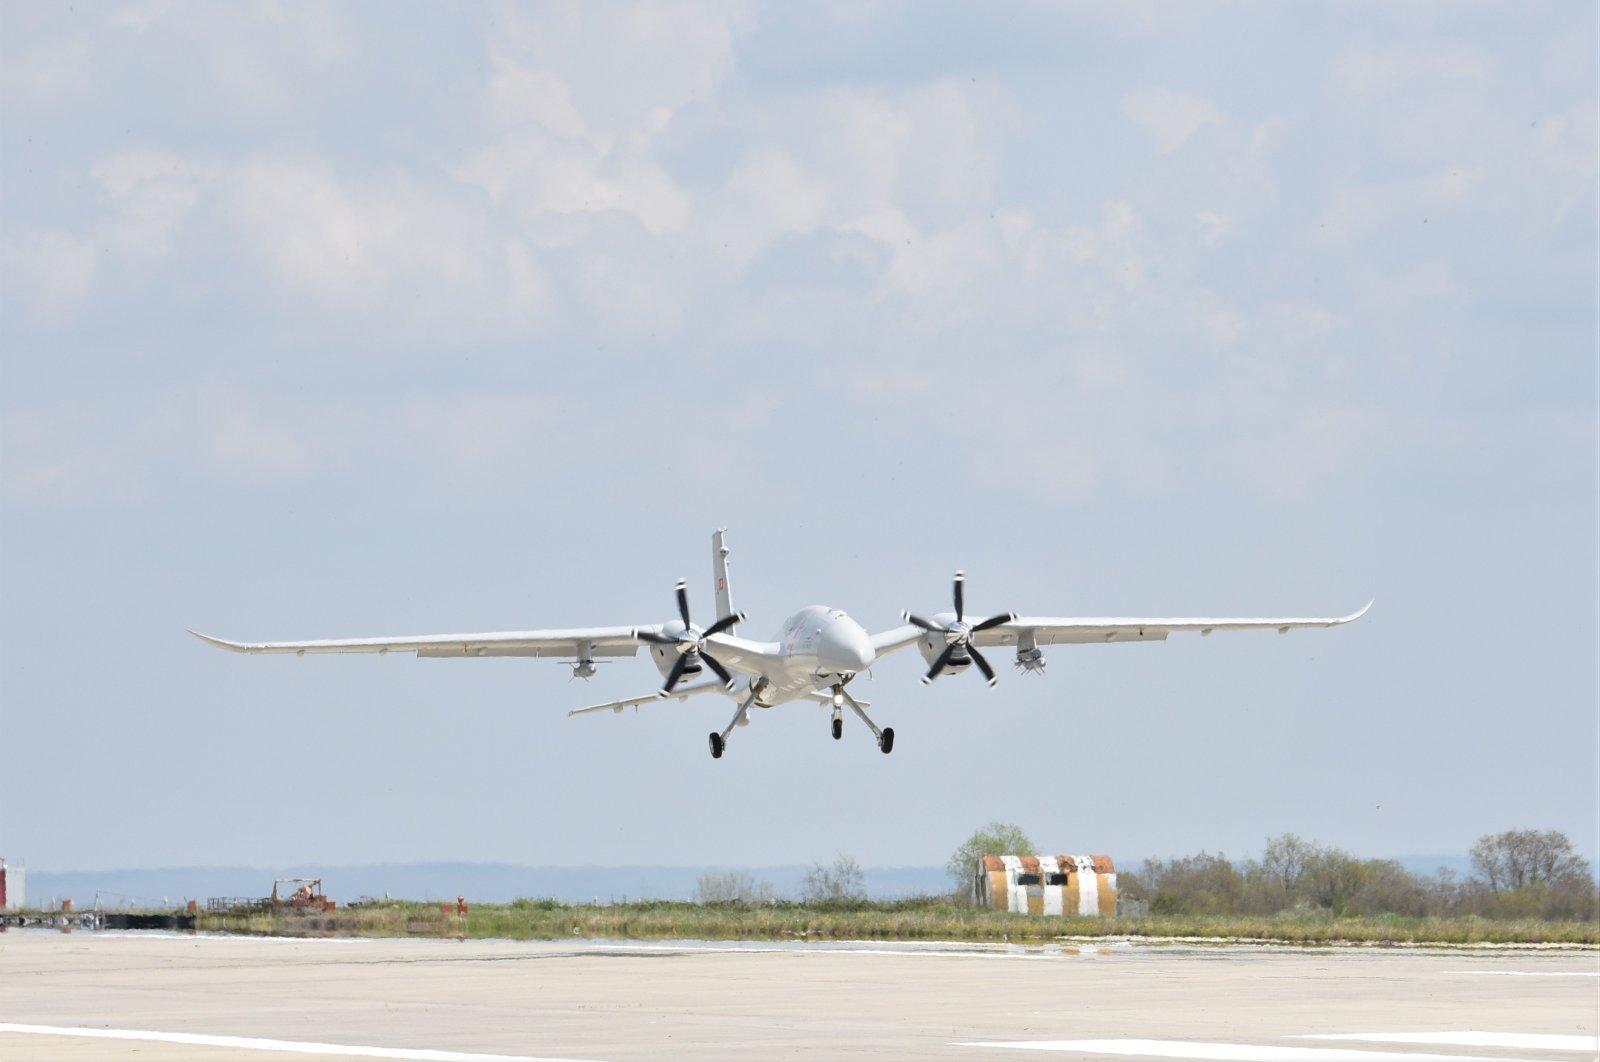 An Akıncı UCAV lands on a runway in northwestern Tekirdağ province, Turkey, April. 22, 2021. (IHA Photo)